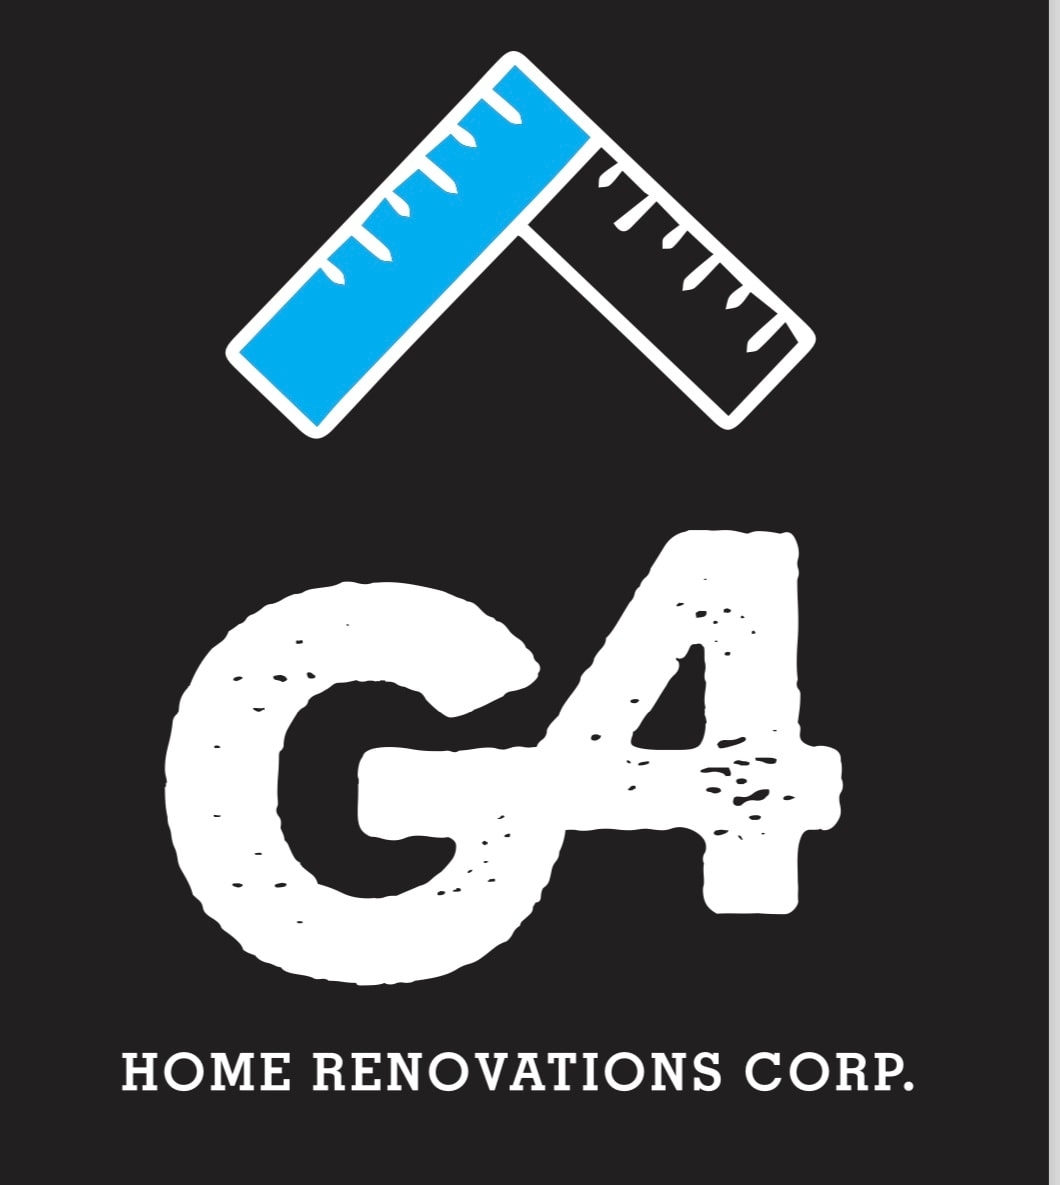 G4 Home Renovations, Corp.